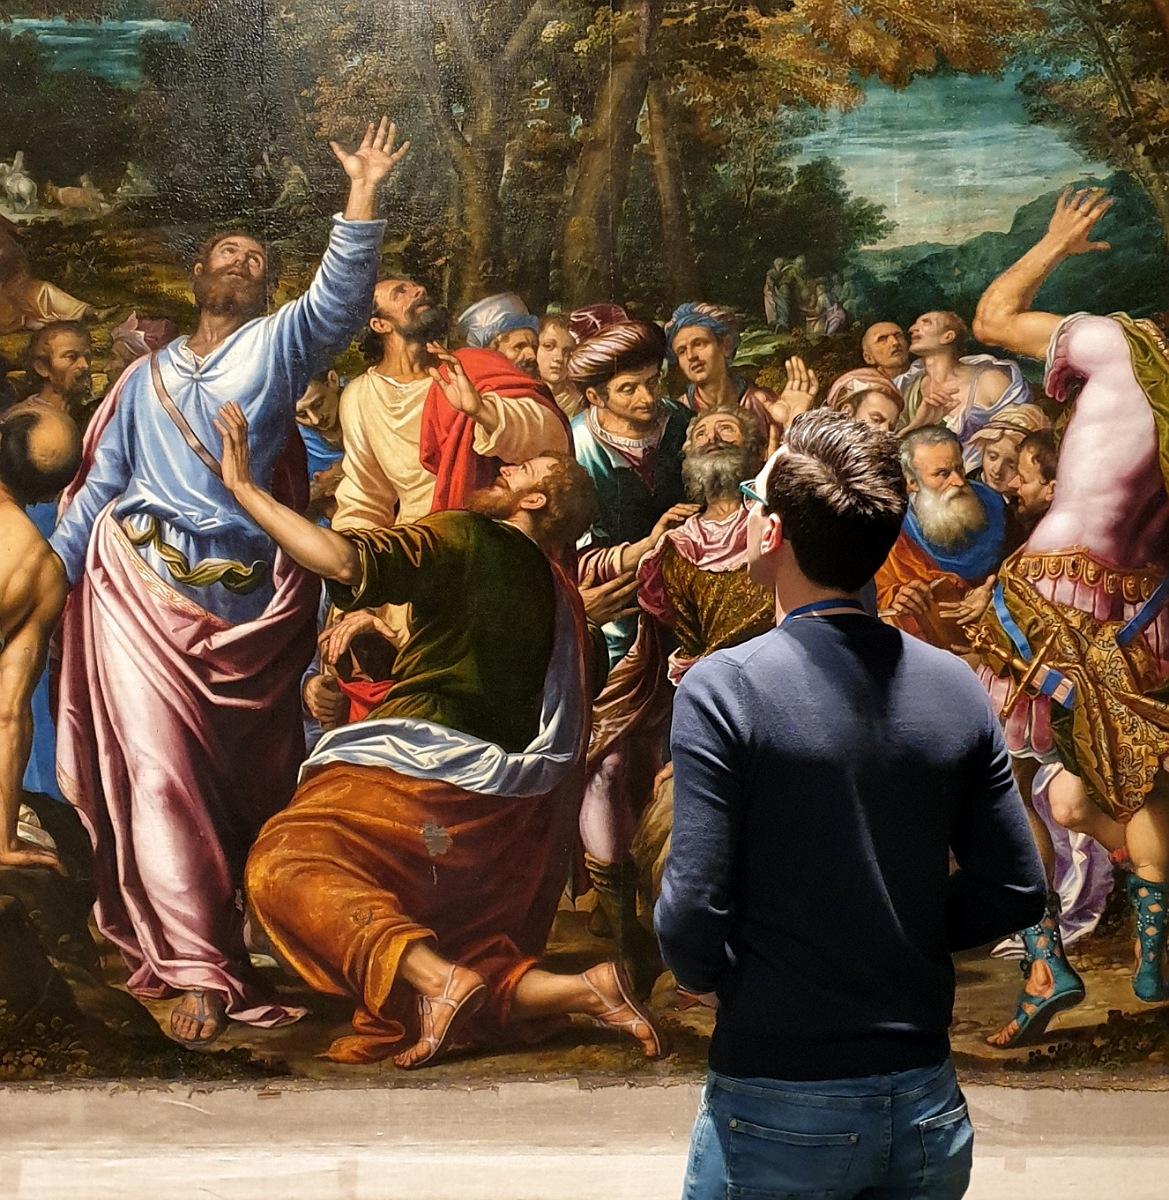 visita mostra peterzano bergamo accademia carrara